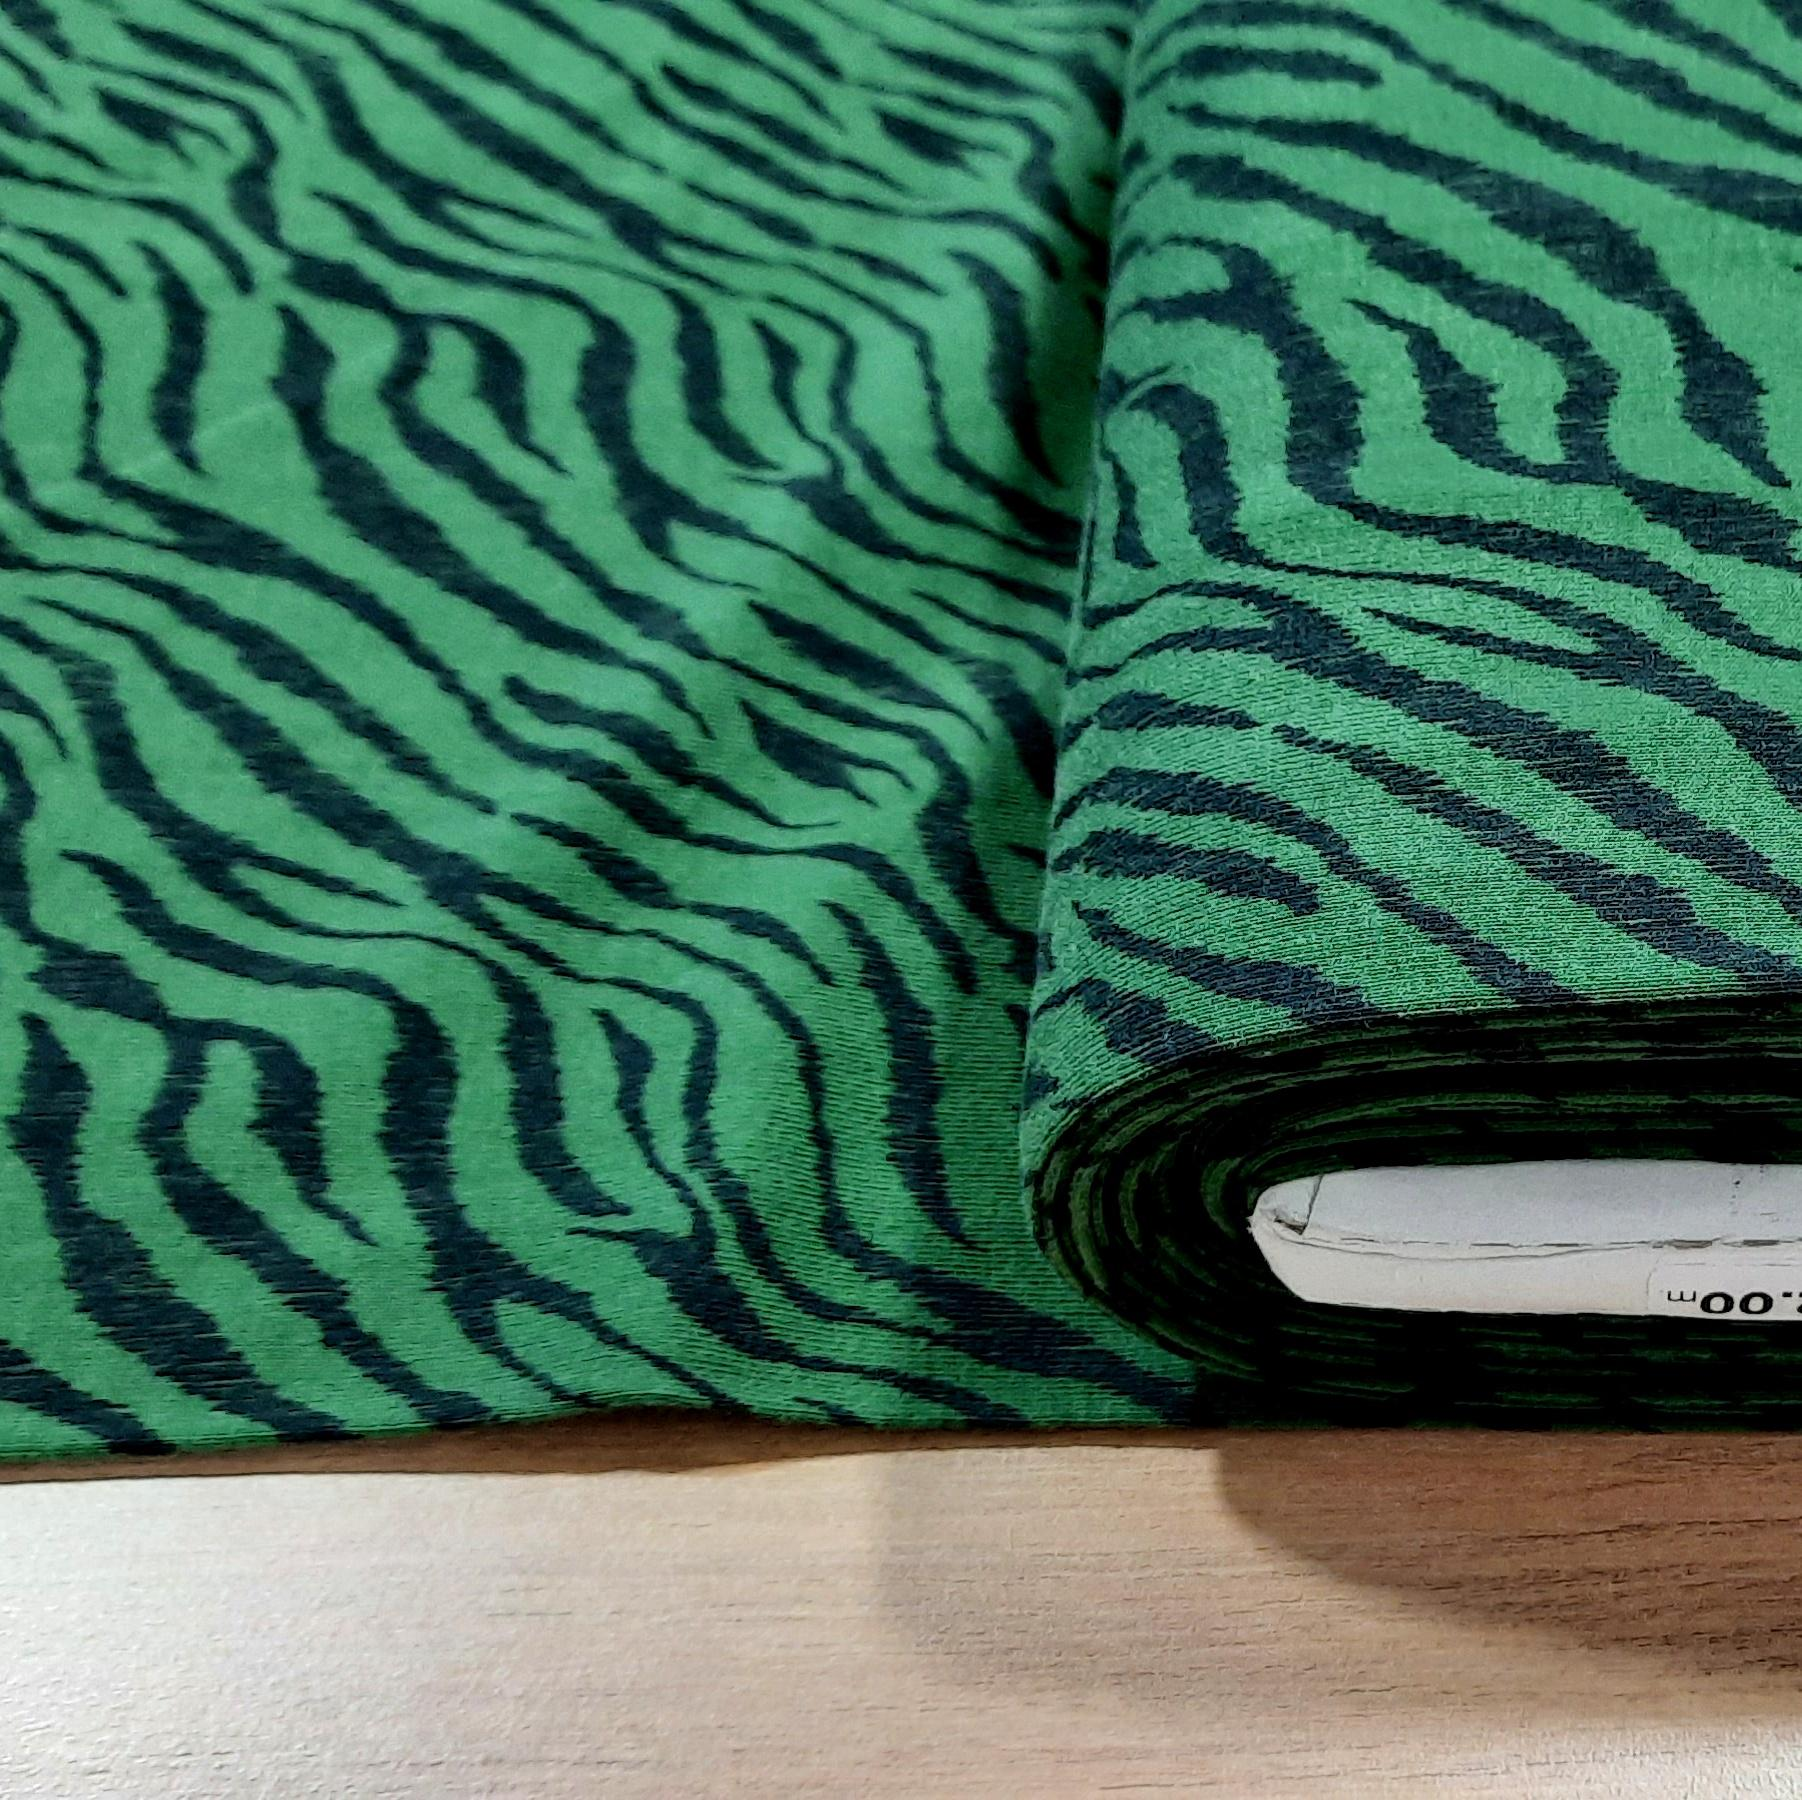 Zebra vert 2